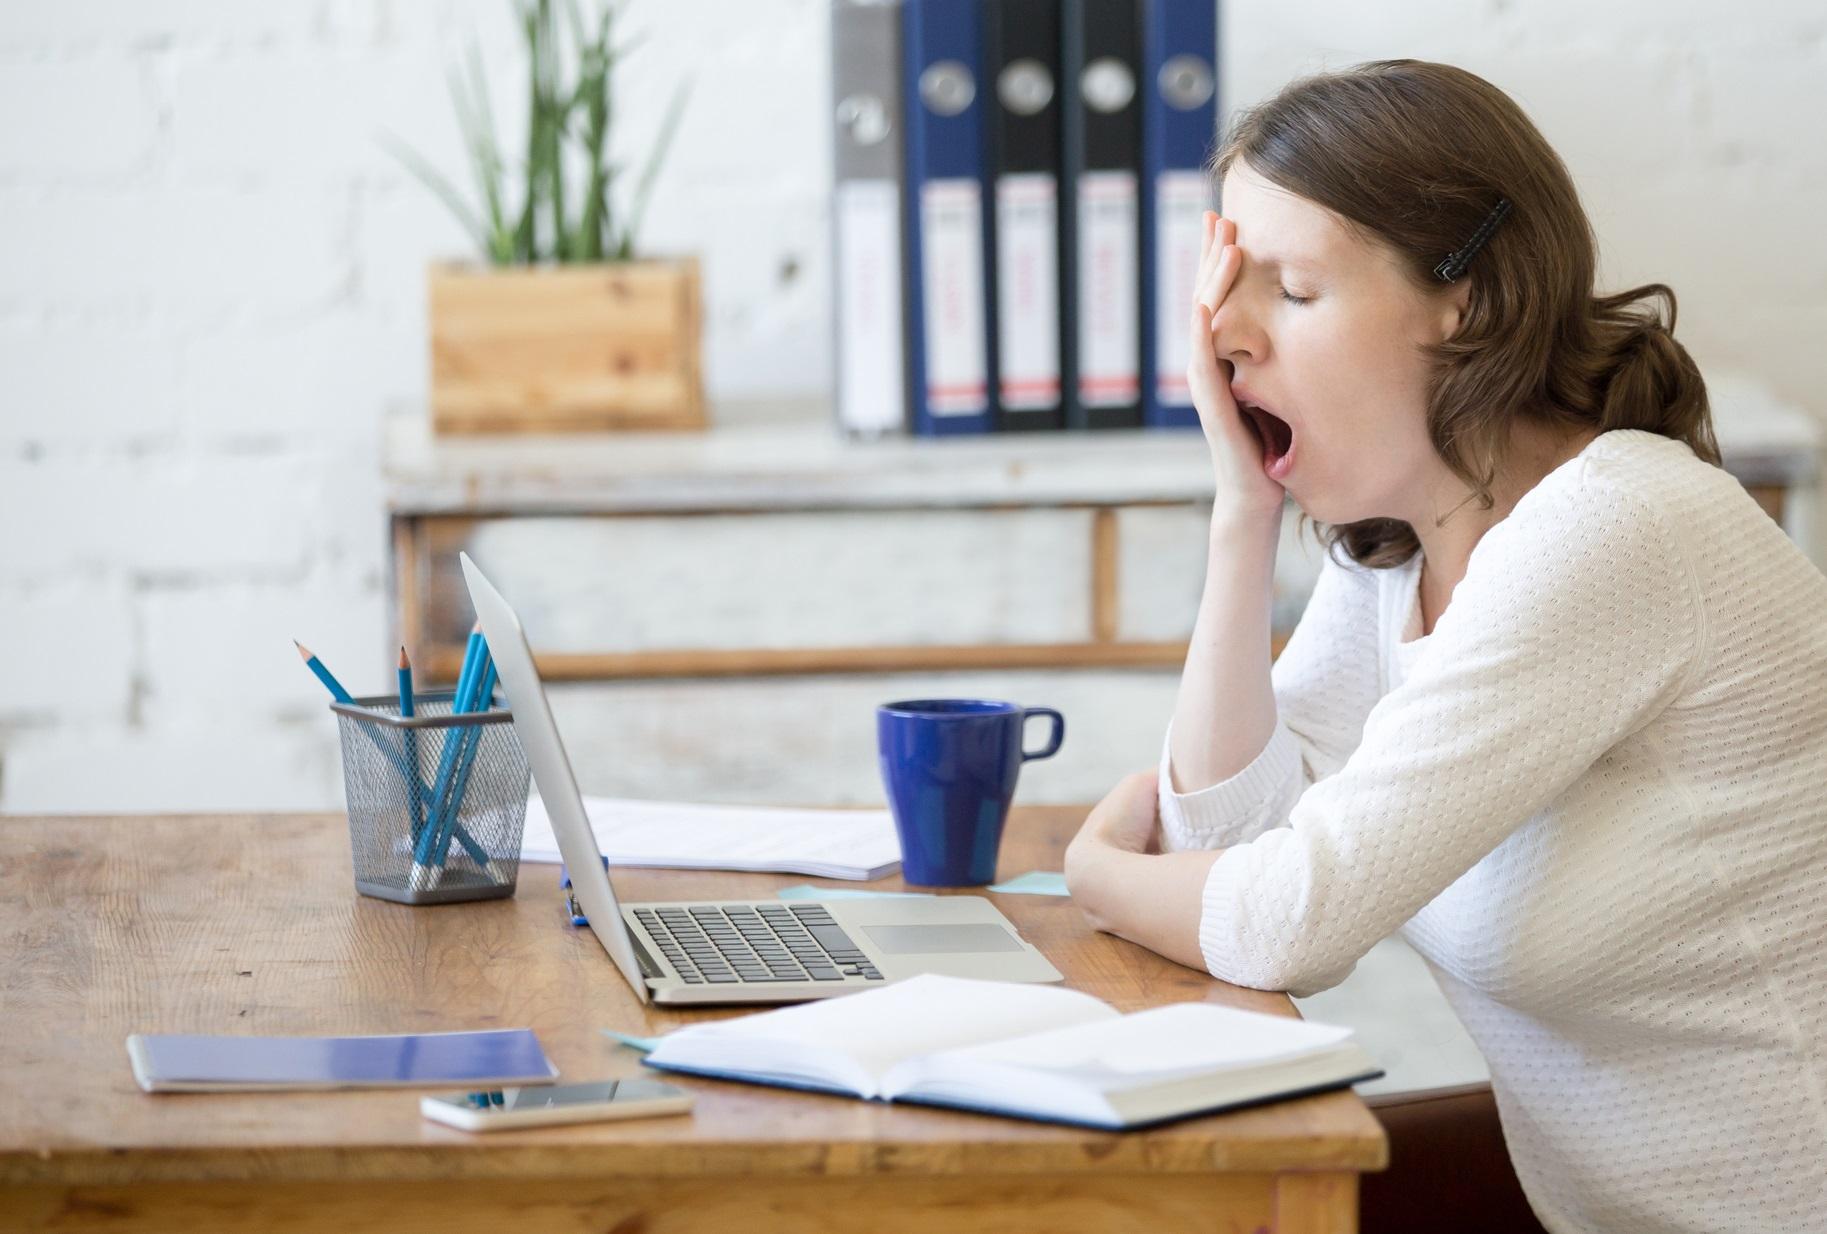 Cv Advice Hays Cv Advice Hays How To Avoid New Job Burnout Viewpoint Hays Careers